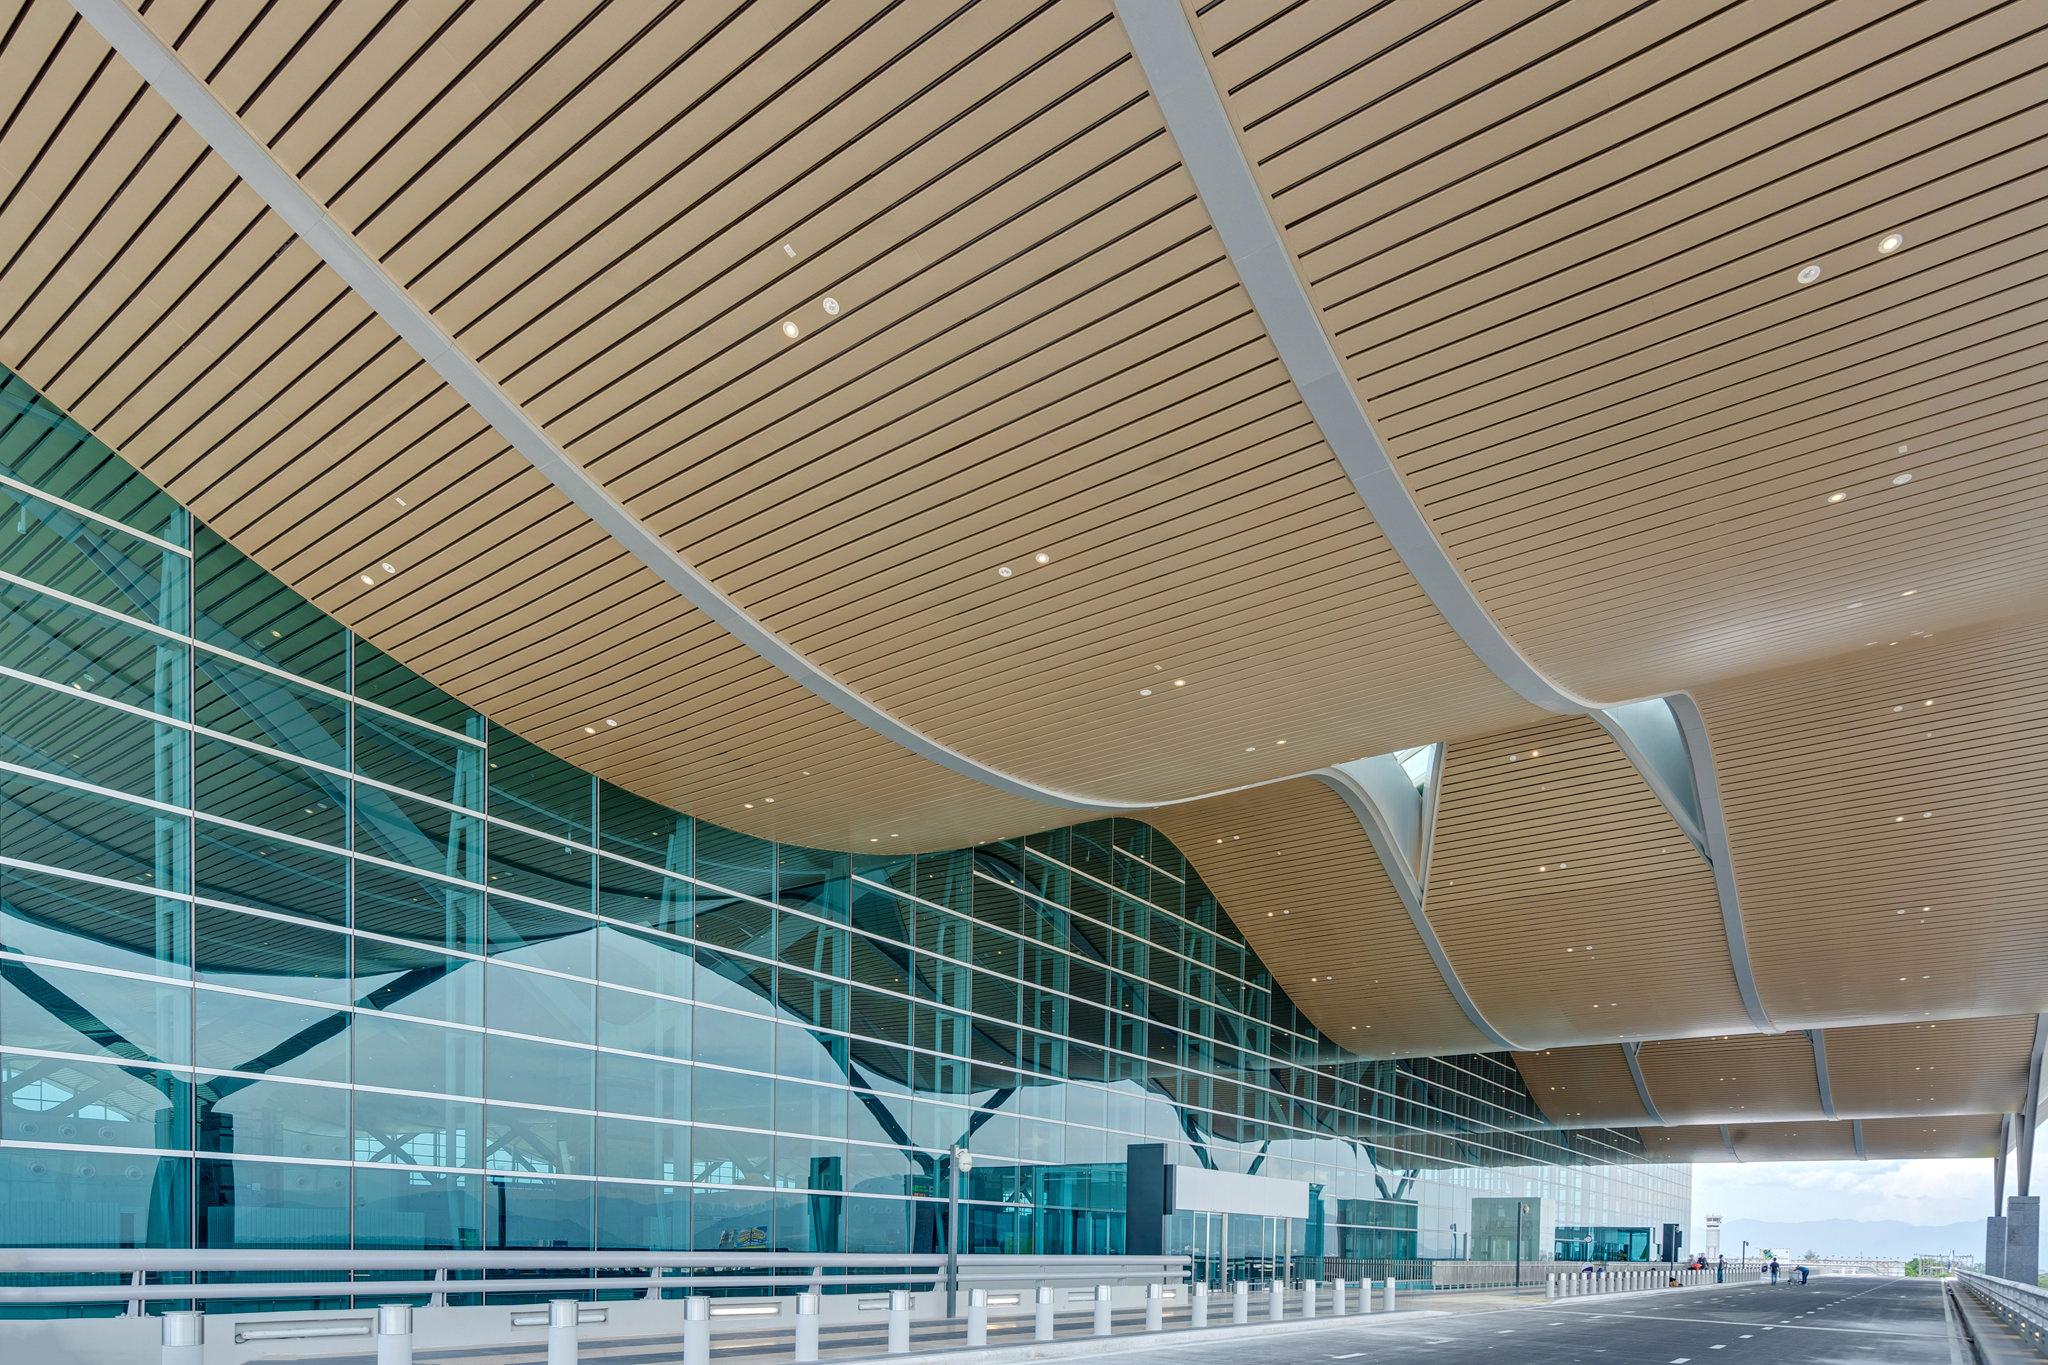 20180626 - Cam Ranh Airport - Architecture - 0296.jpg